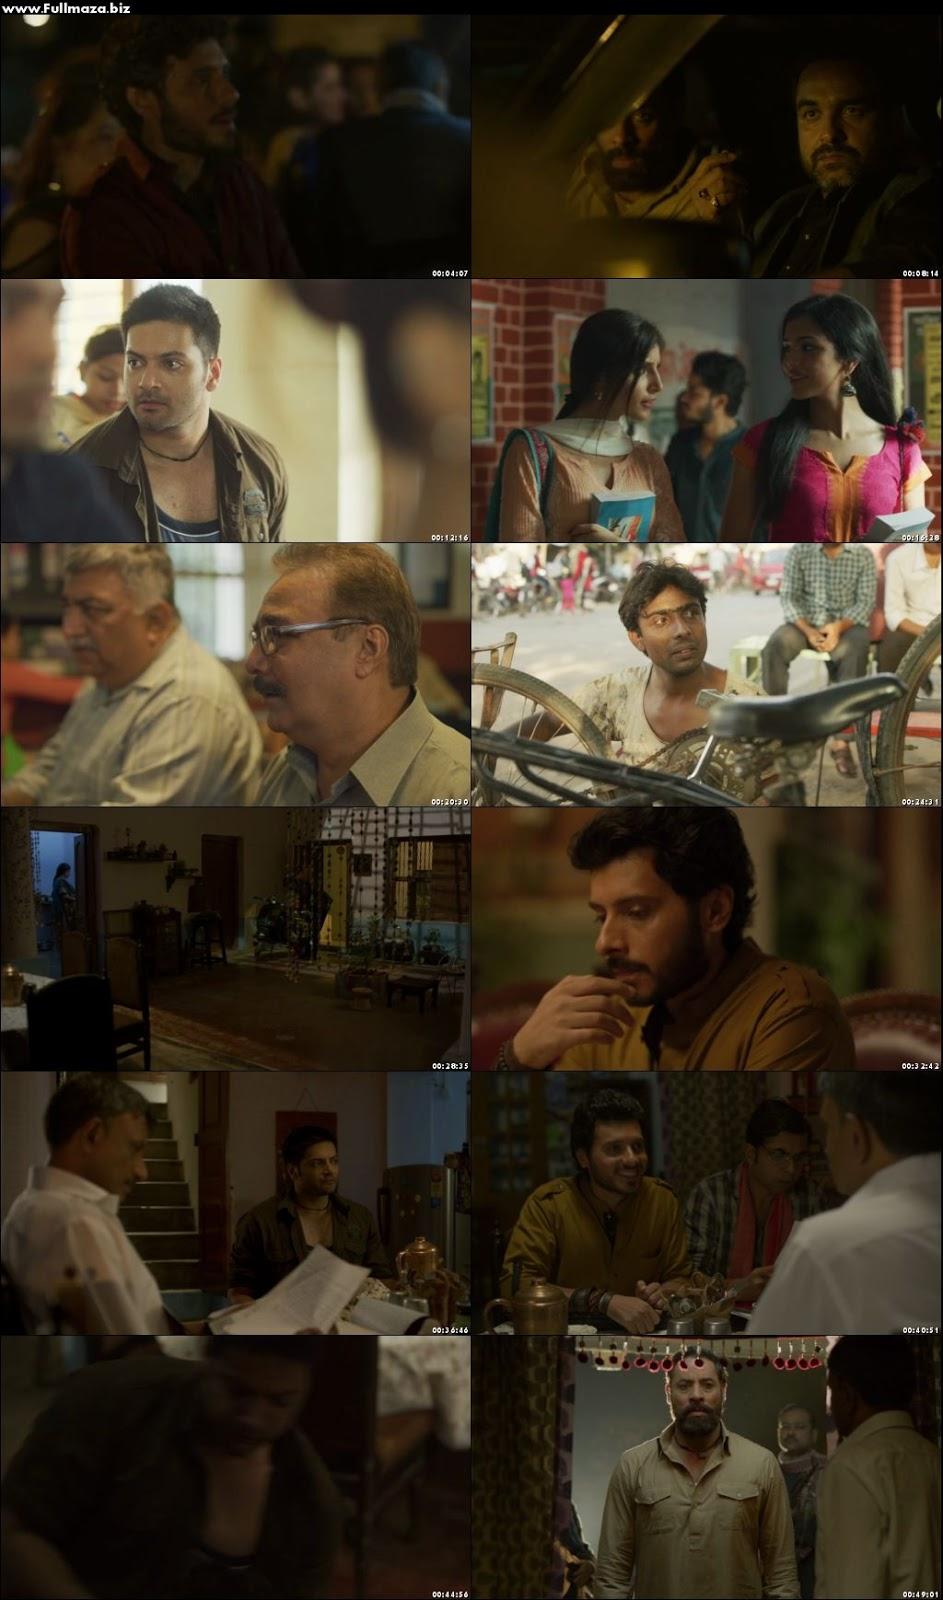 Mirzapur (2018) S01 (2018) Hindi Web Series 720p [Complete